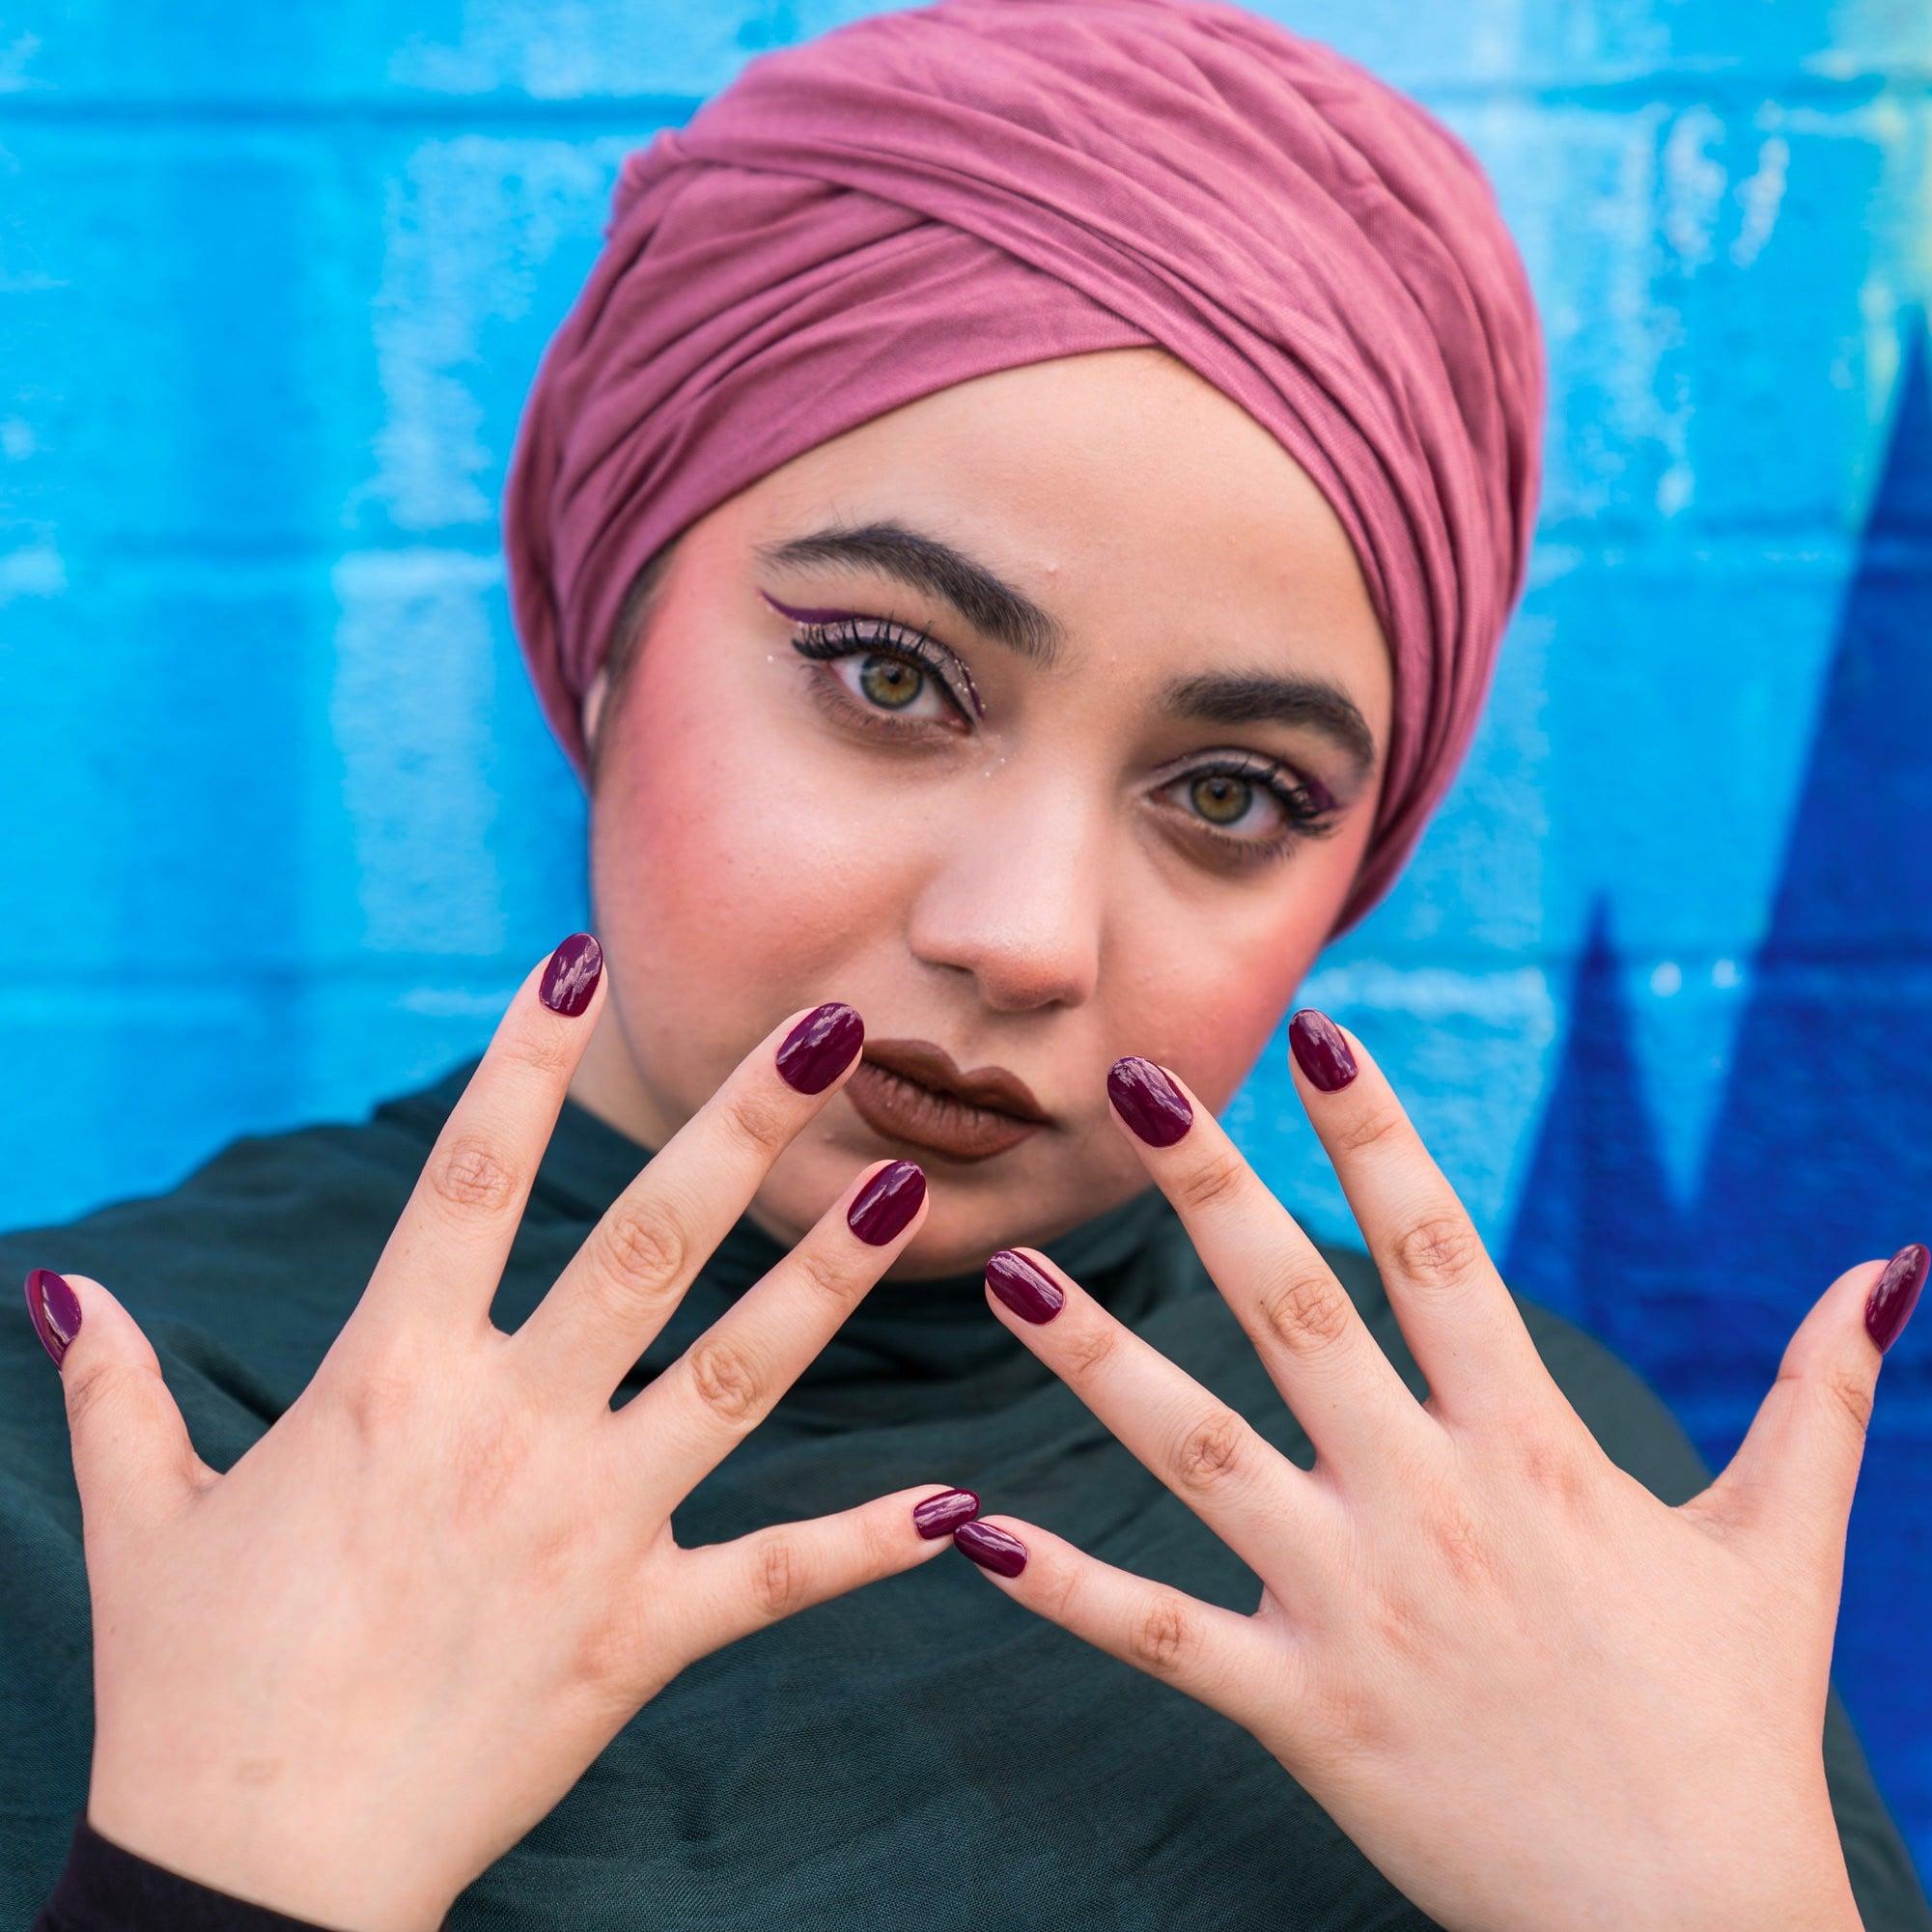 Orly x MuslimGirl Halal-Certified Nail Polish | POPSUGAR Beauty